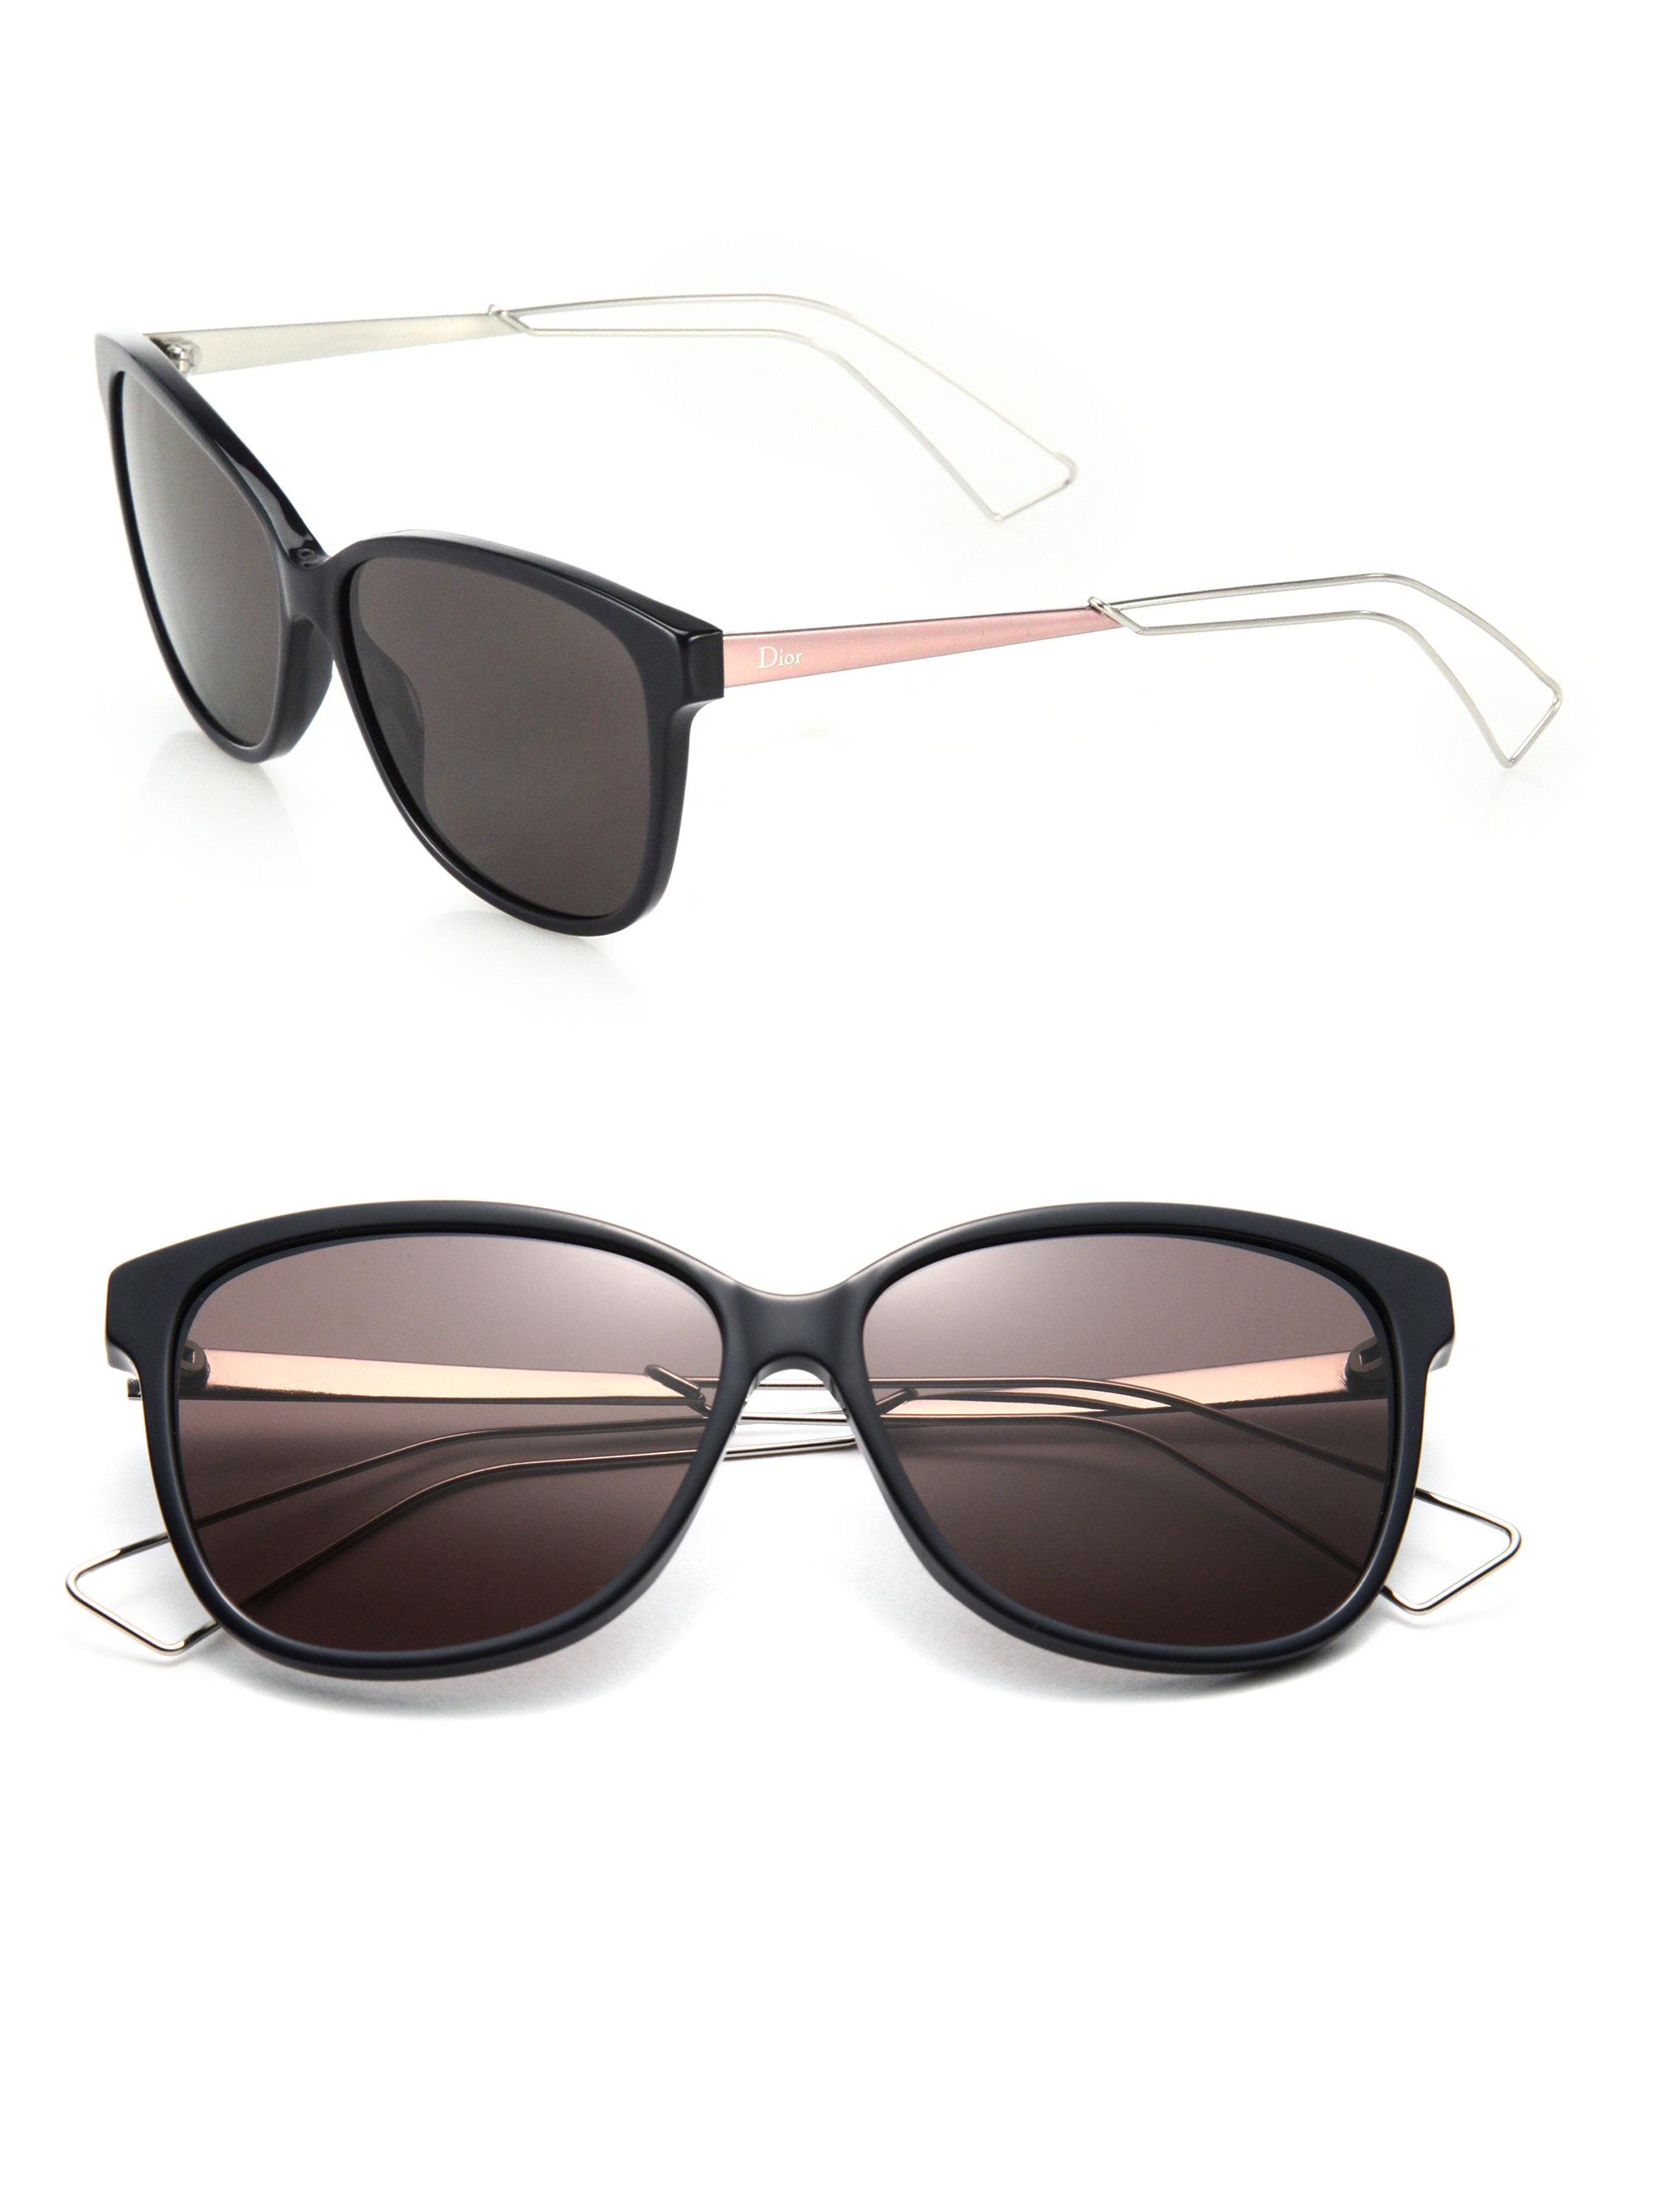 c05d304cda59 Celine Paris Sunglasses